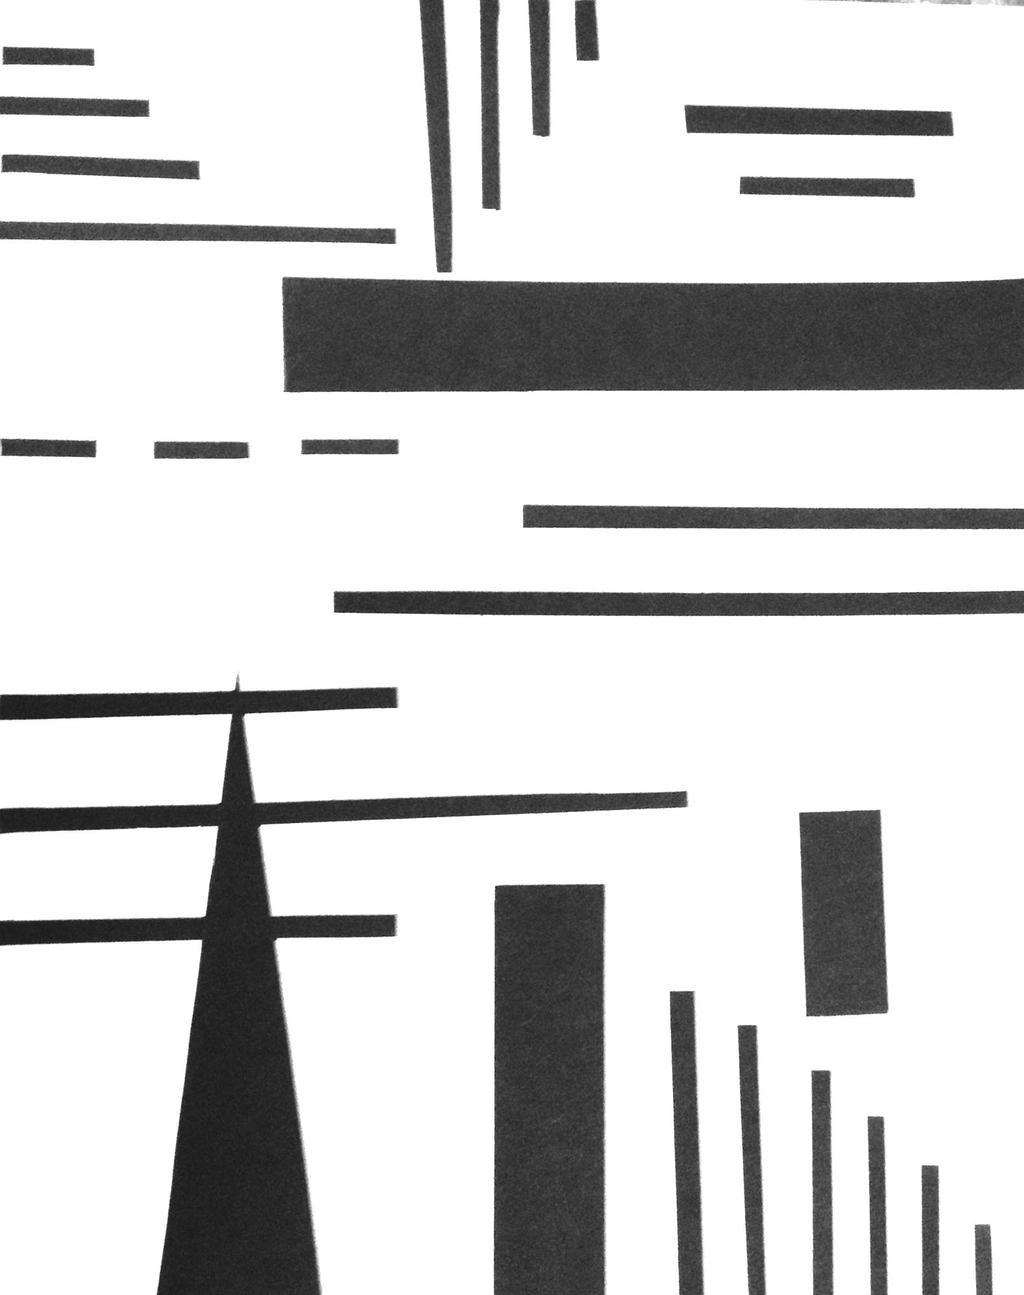 Line Composition Design : Horizontal and vertical lines art pixshark